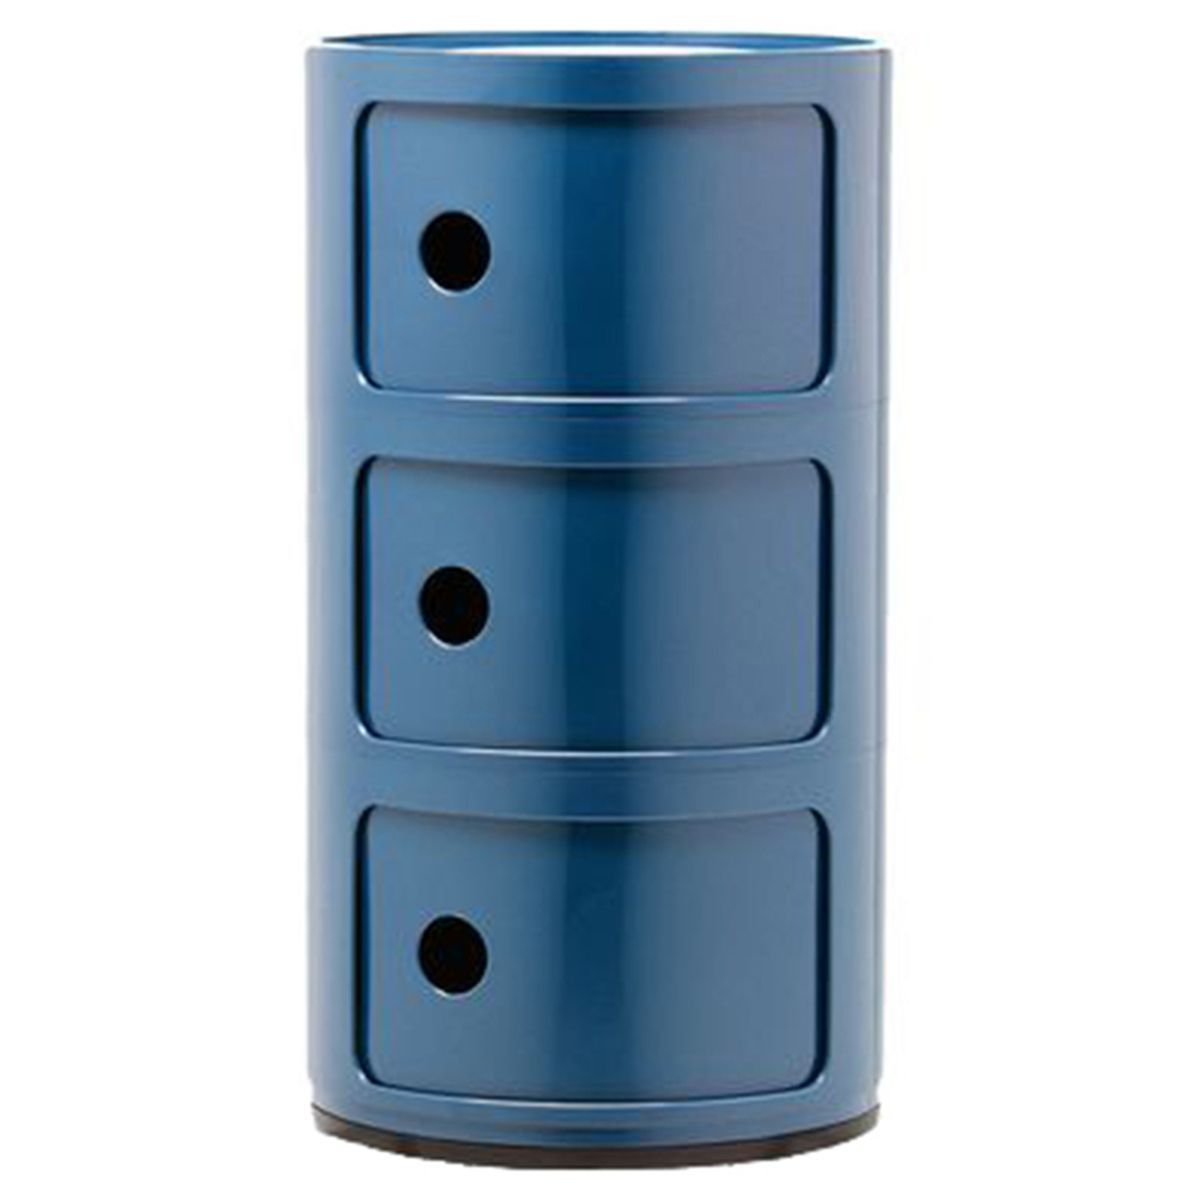 Kartell Componibili Storage Unit 3 Modules Blue Componibili Storage Unit 3 Modules Blue Appareldesign Blue Componibi In 2020 Kartell Storage Unit The Unit